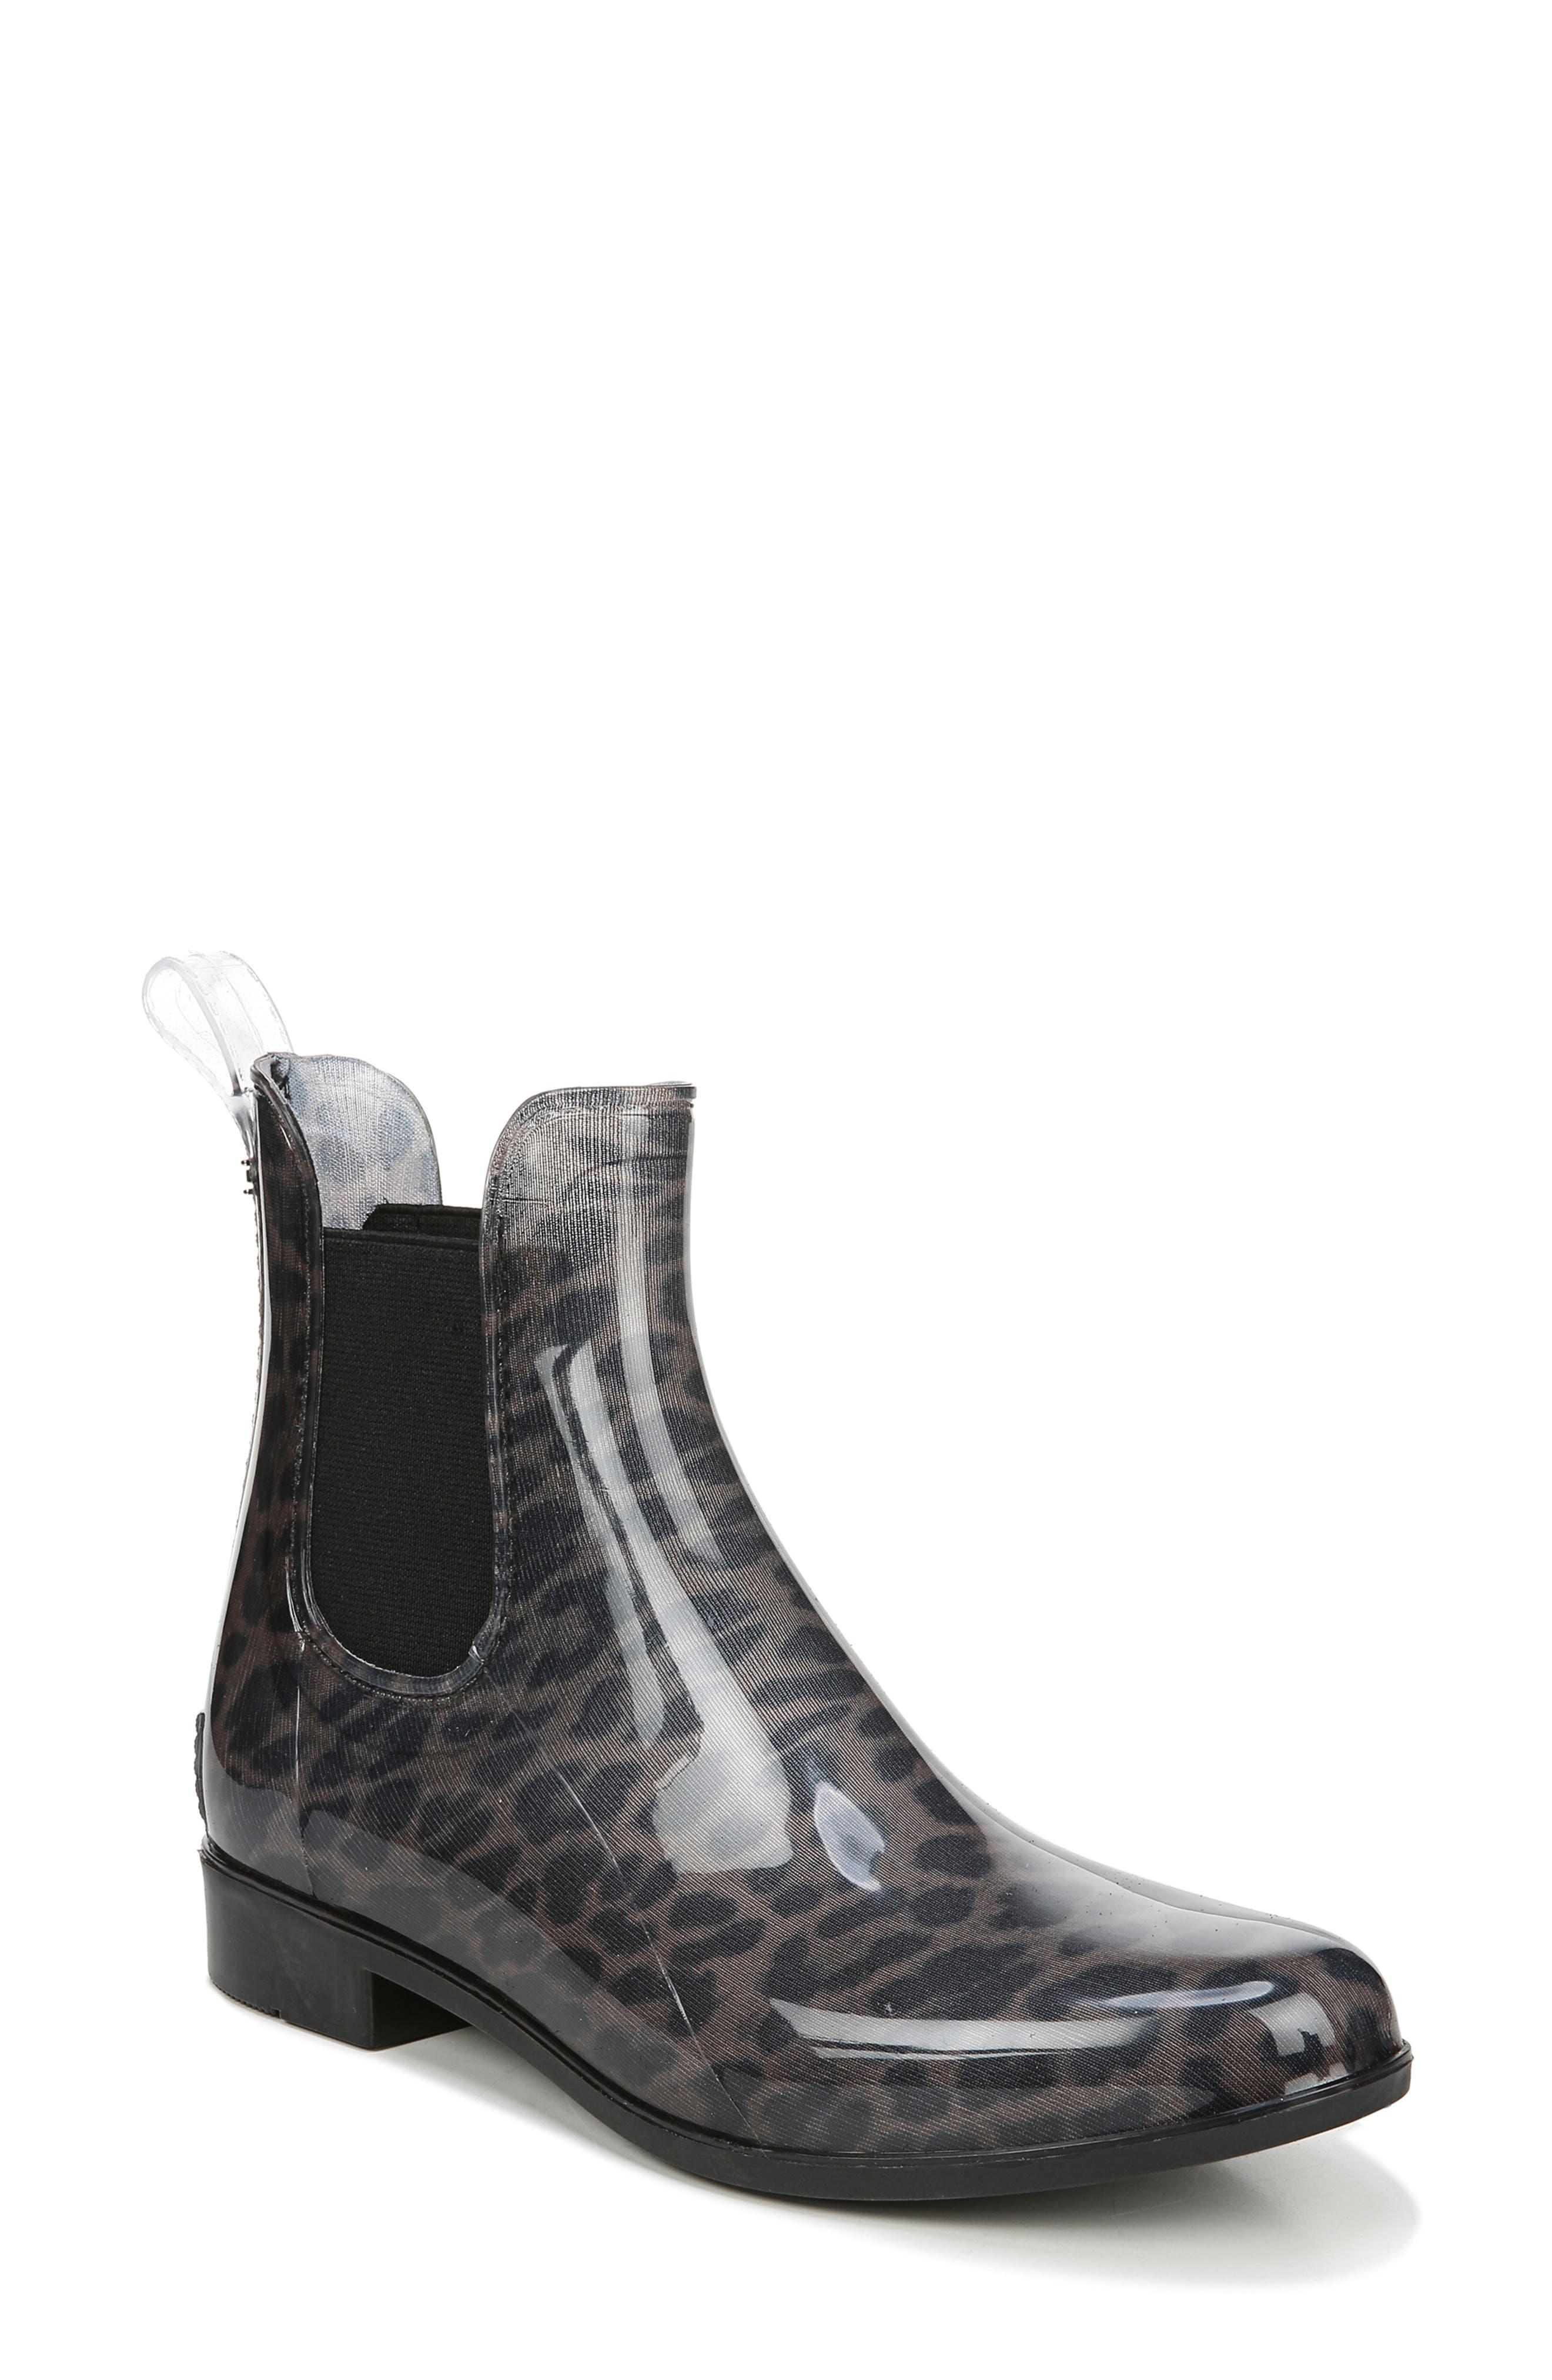 Sam Edelman Tinsley Rain Boot, Black